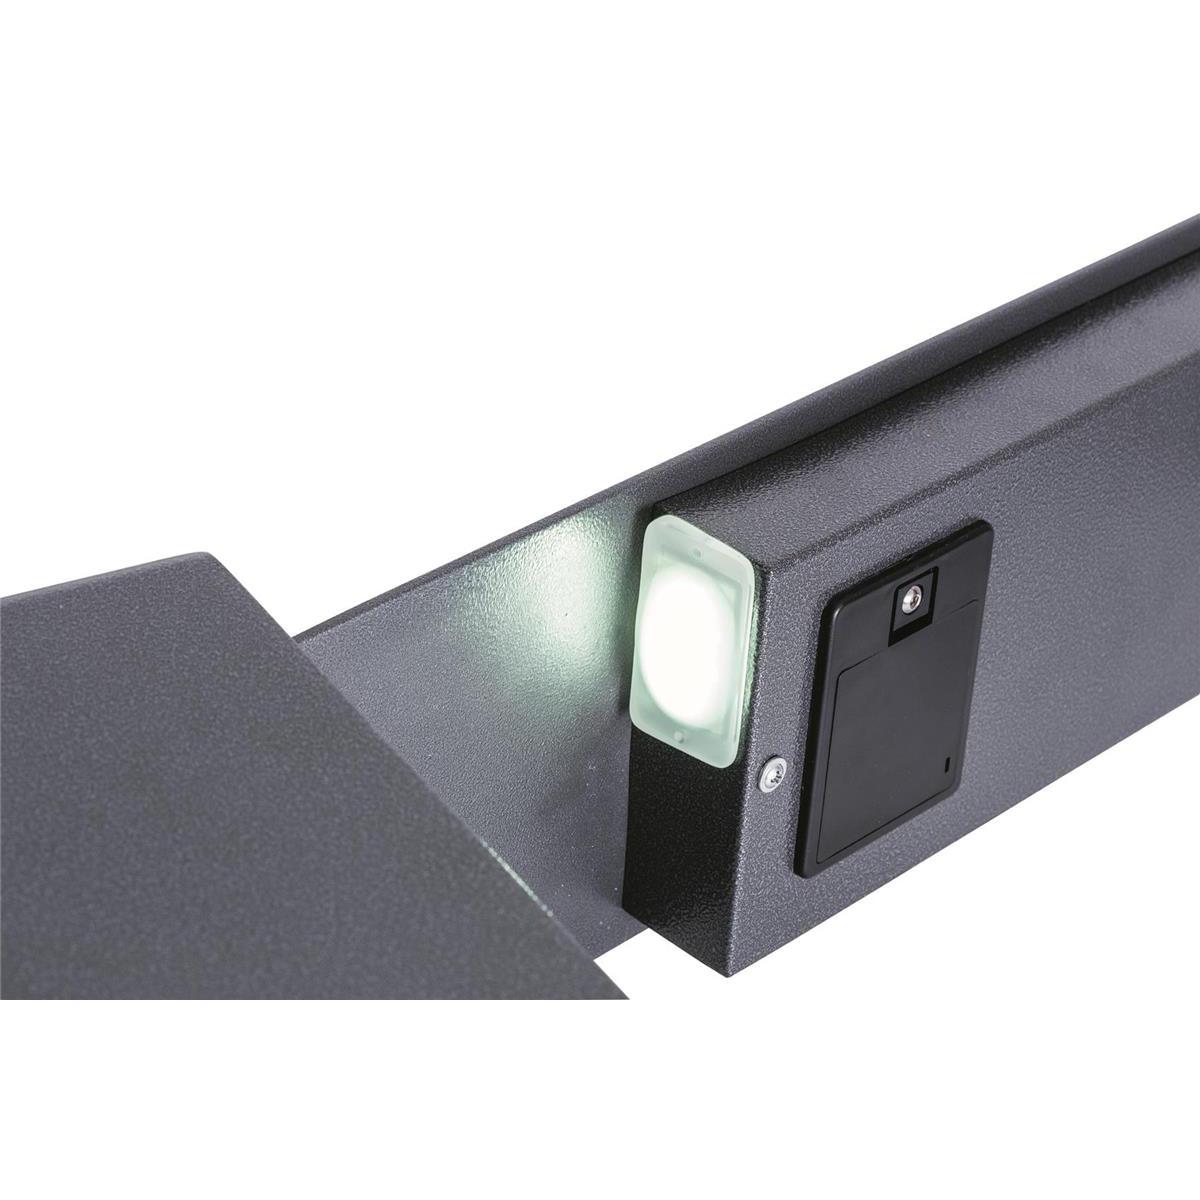 Phoenix Digital Safe Changeable Code Electronic Lock 17L Capacity 8kg W350xD250xH250mm Ref SS0802E